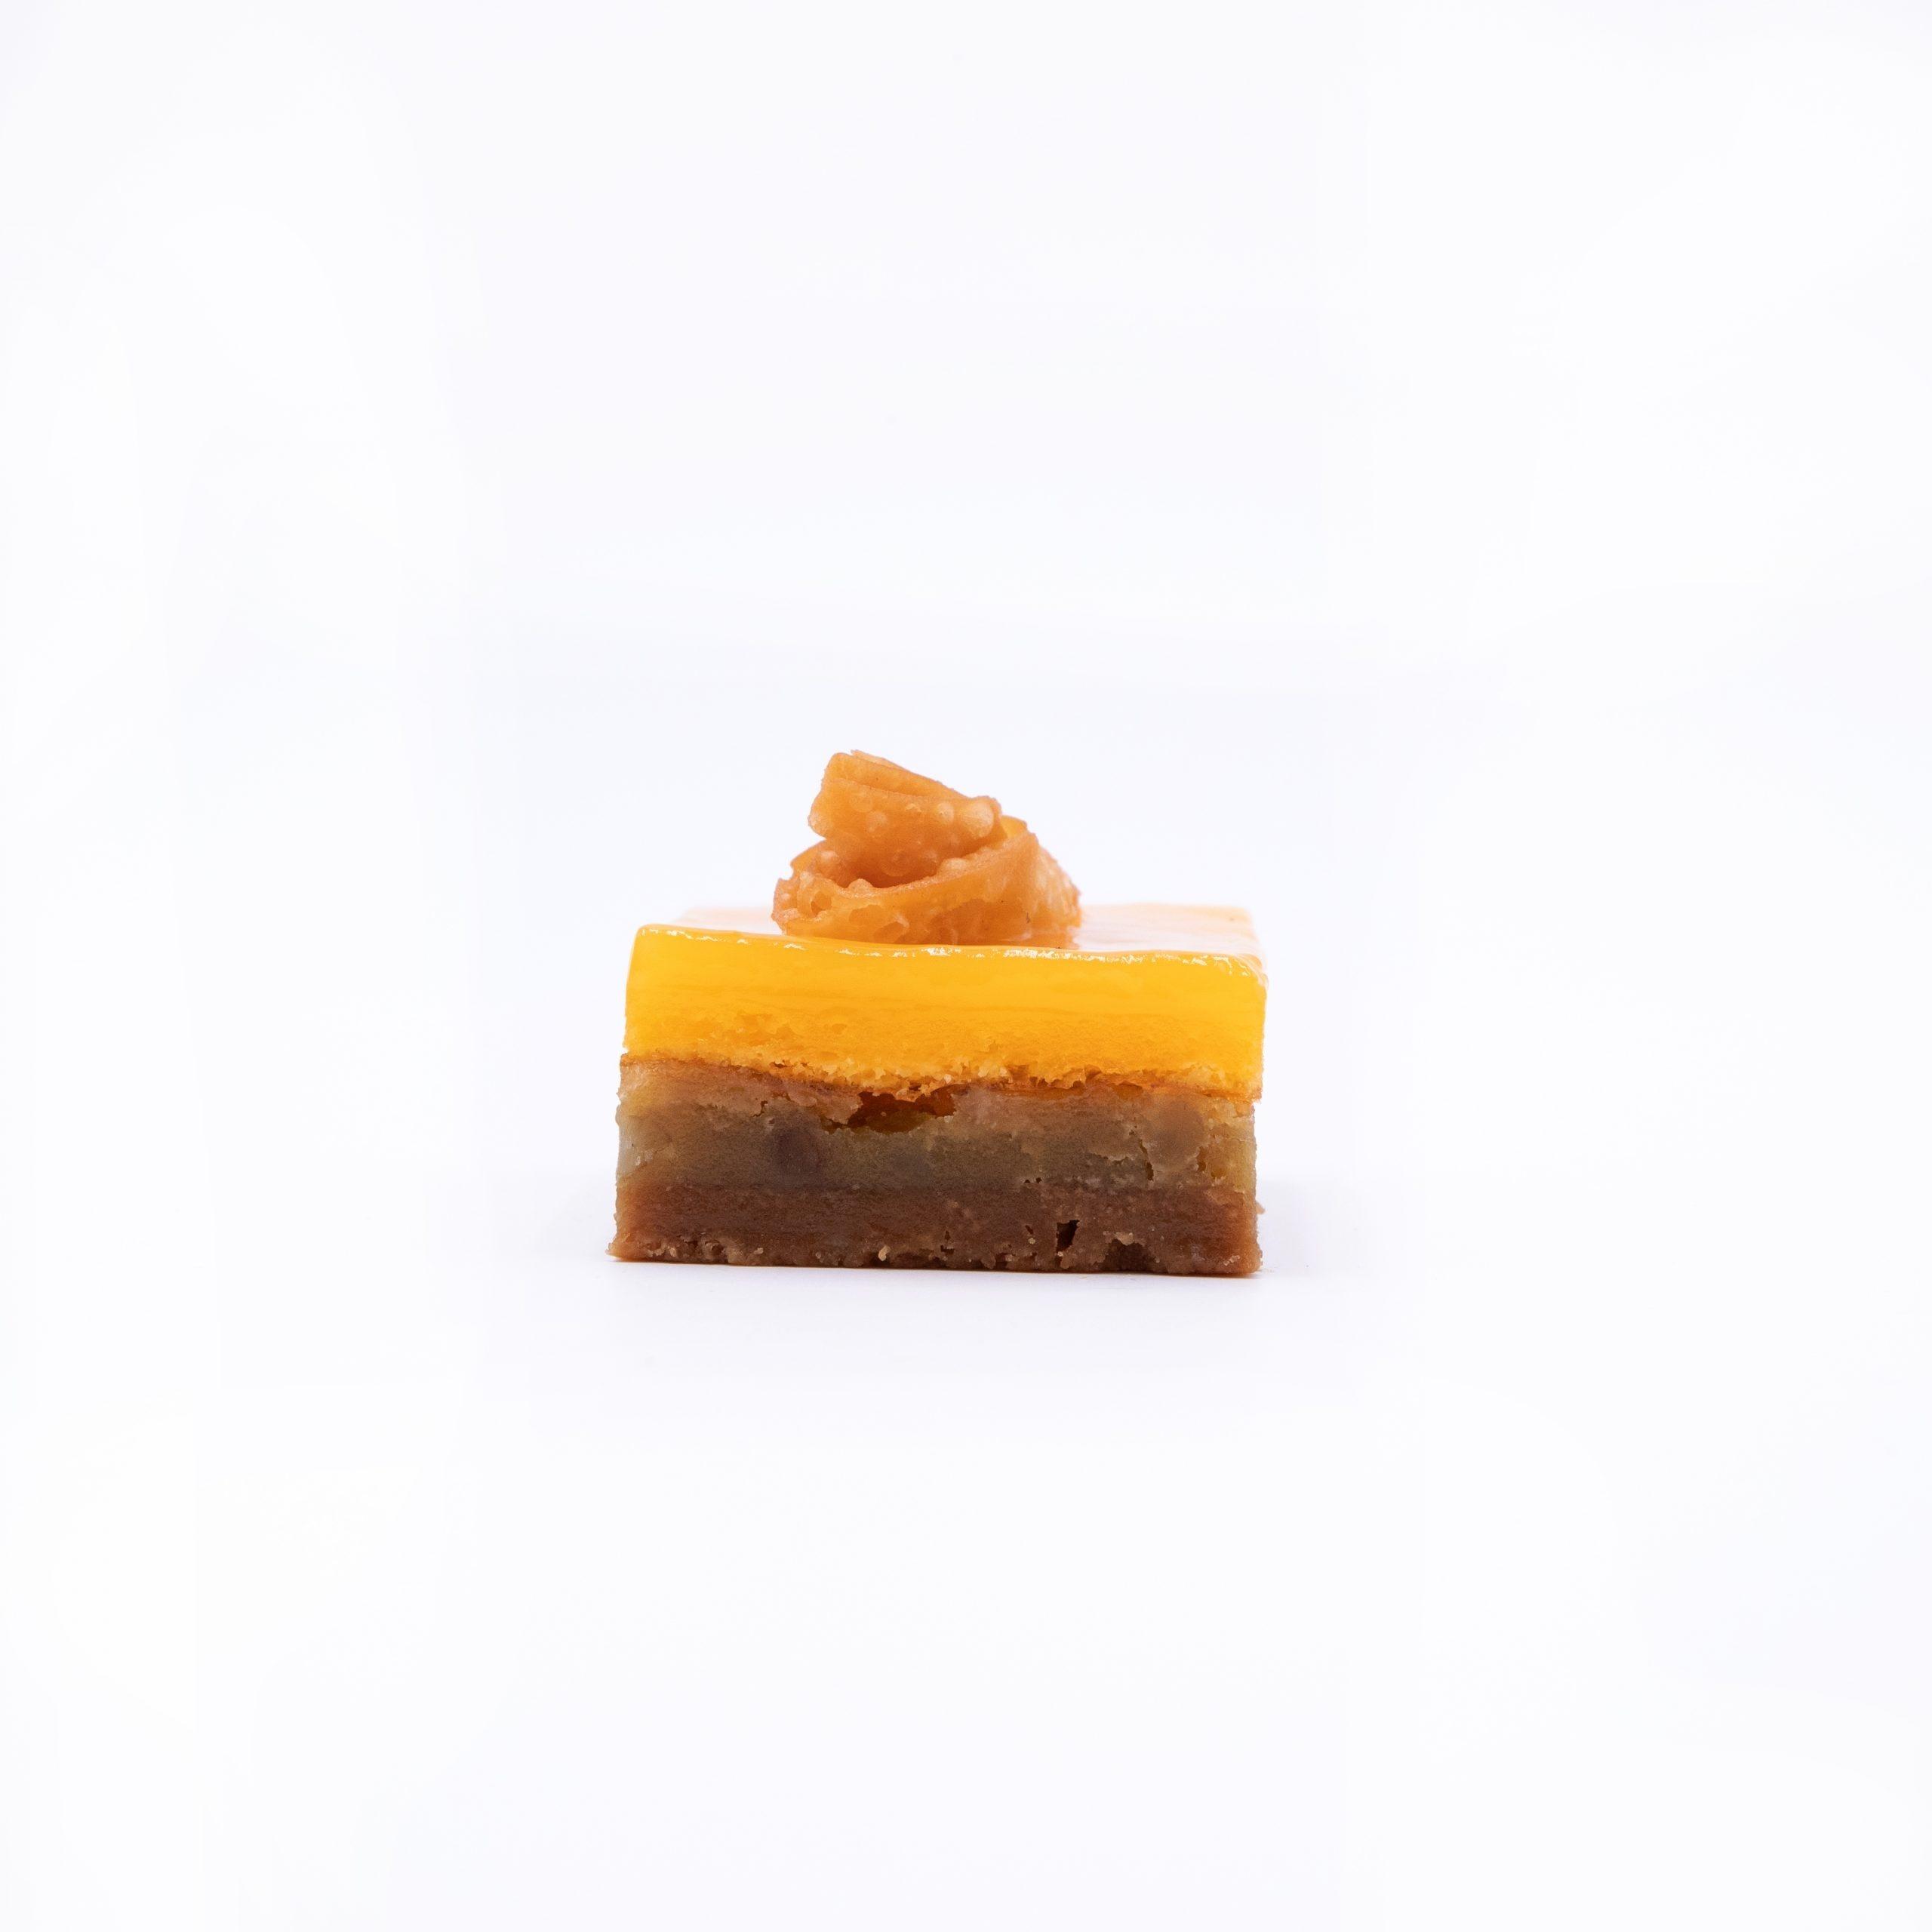 segredo-sao-bernardo-atelier-do-doce-alfeizerao-pastelaria-doces-conventuais